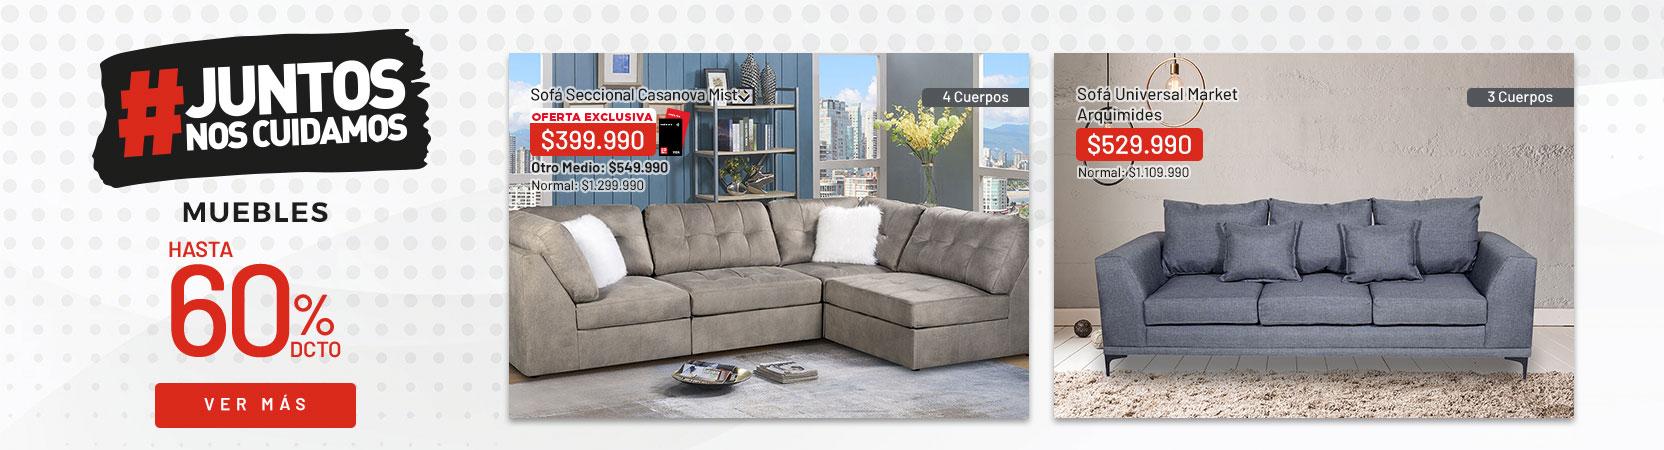 Muebles hasta 60% dcto